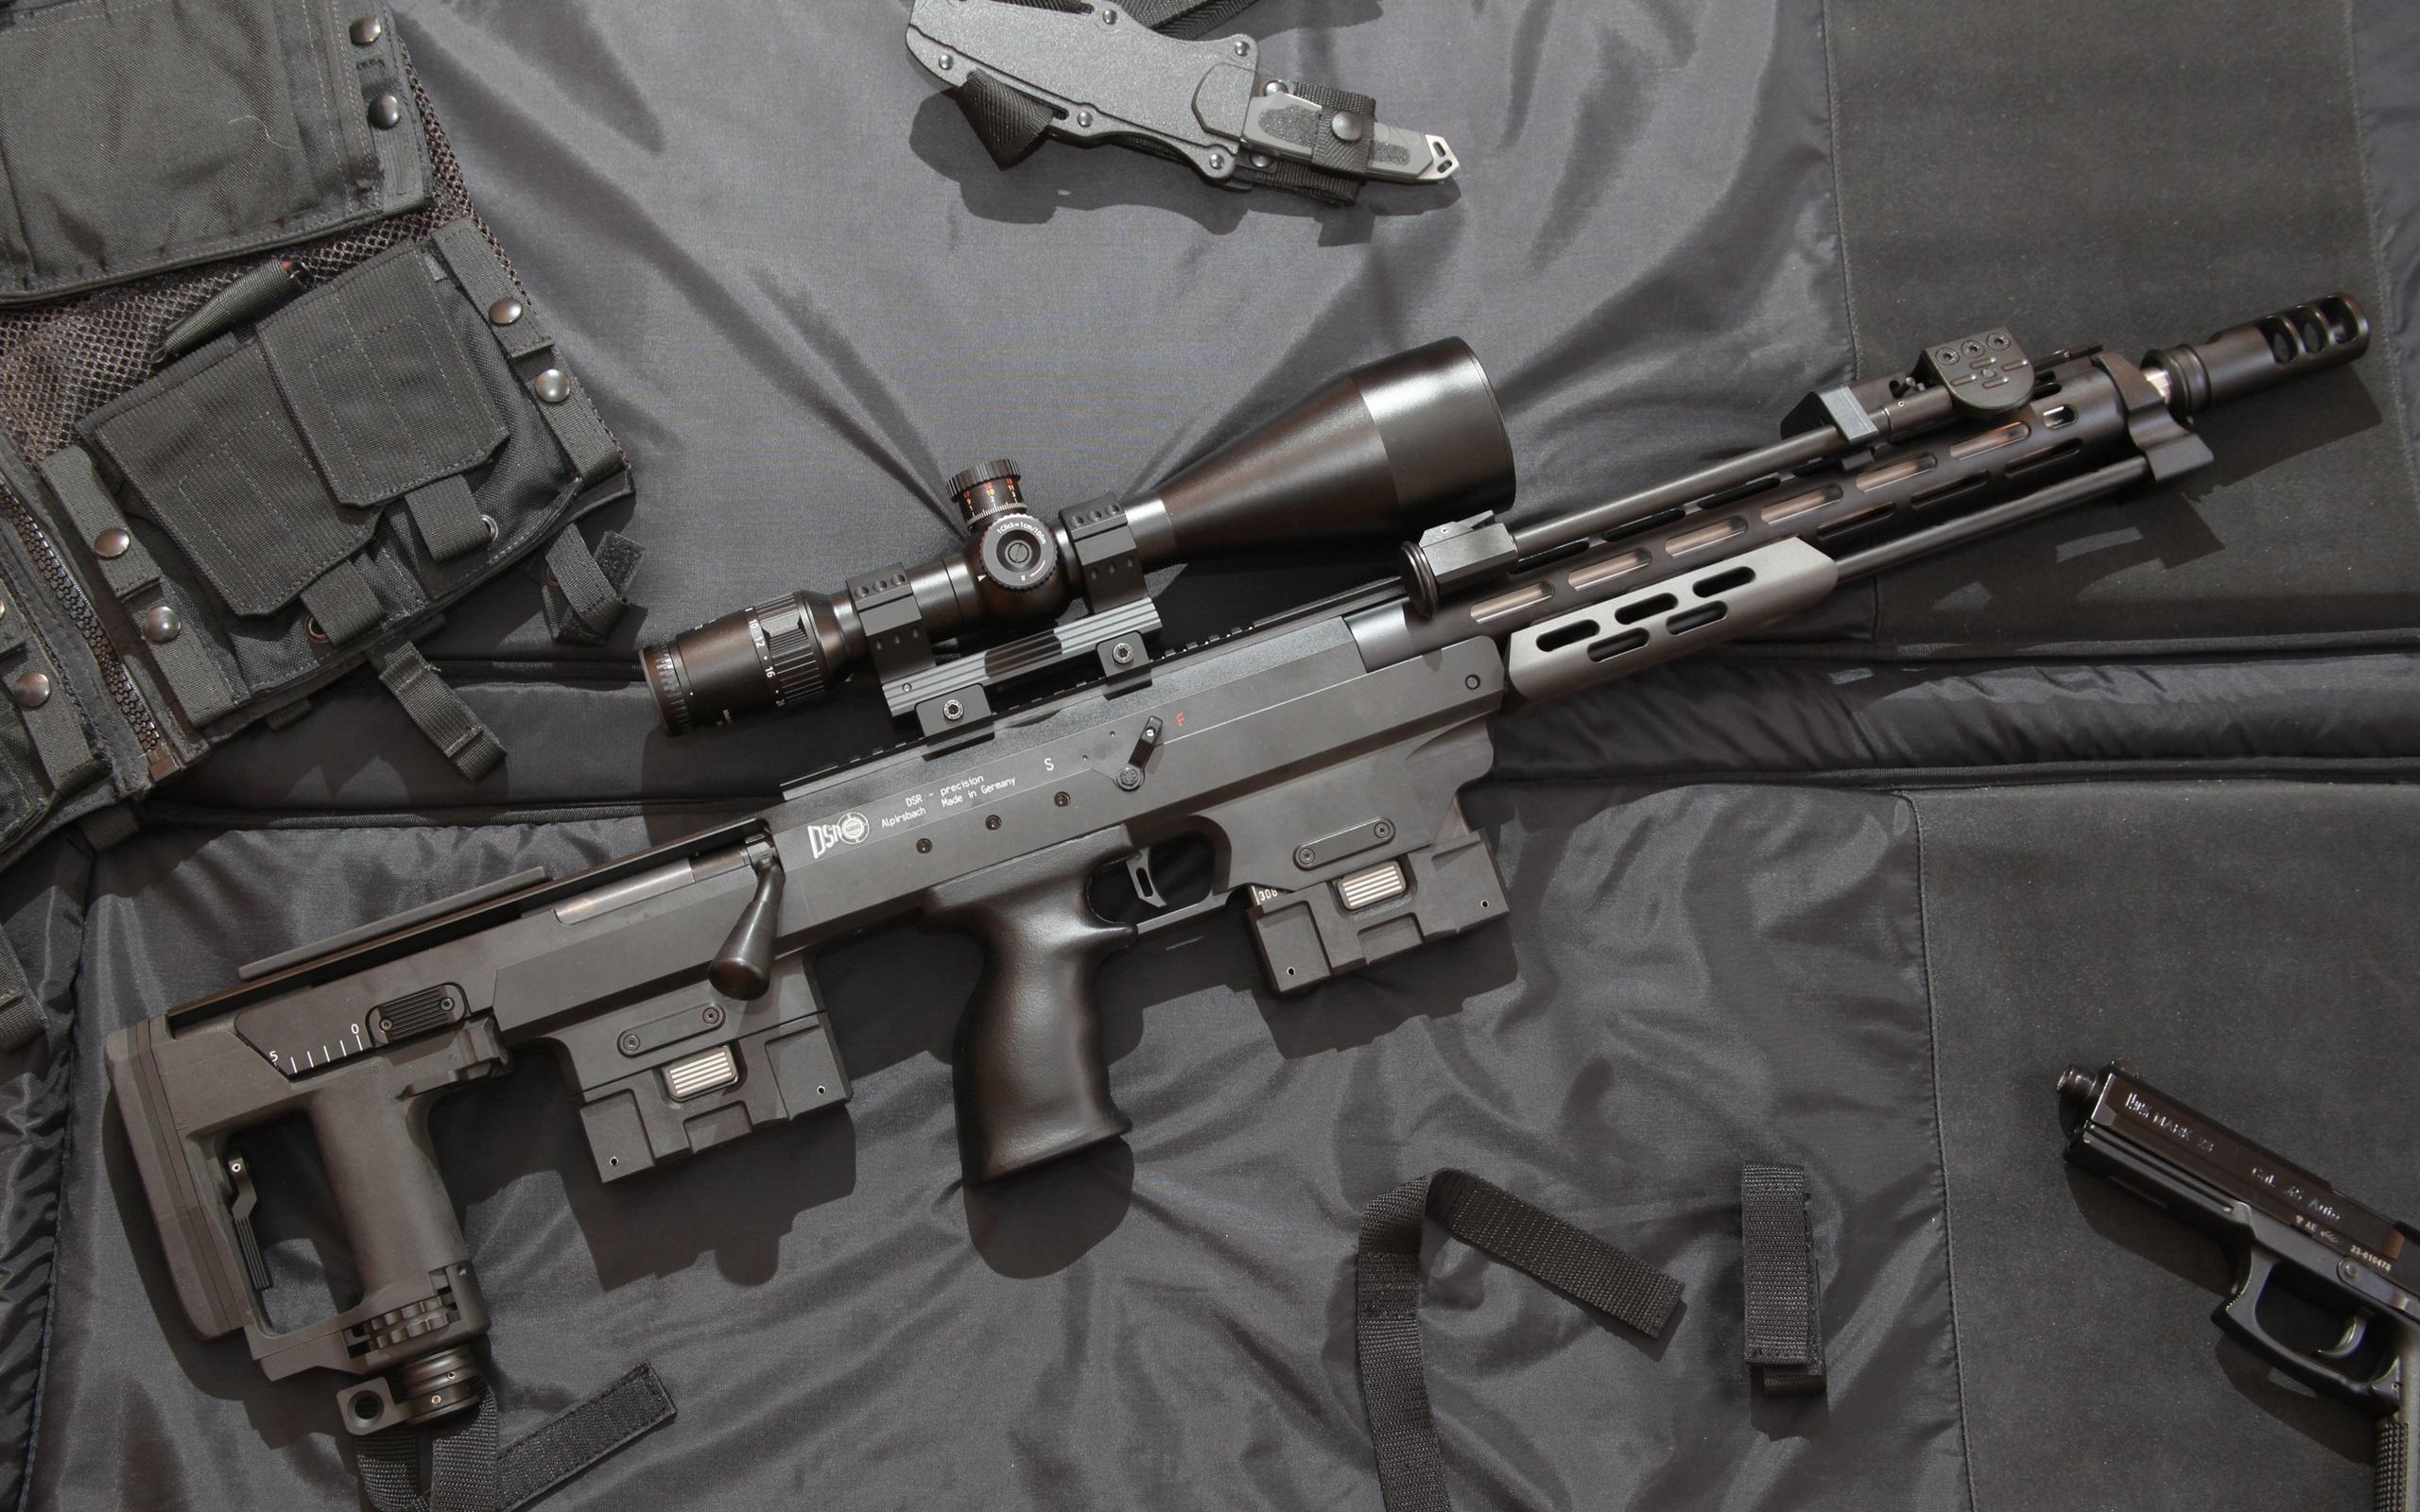 16 Luxury Pubg Wallpaper Iphone 6: 壁纸 DSR-1狙击步枪,武器 3840x2160 UHD 4K 高清壁纸, 图片, 照片